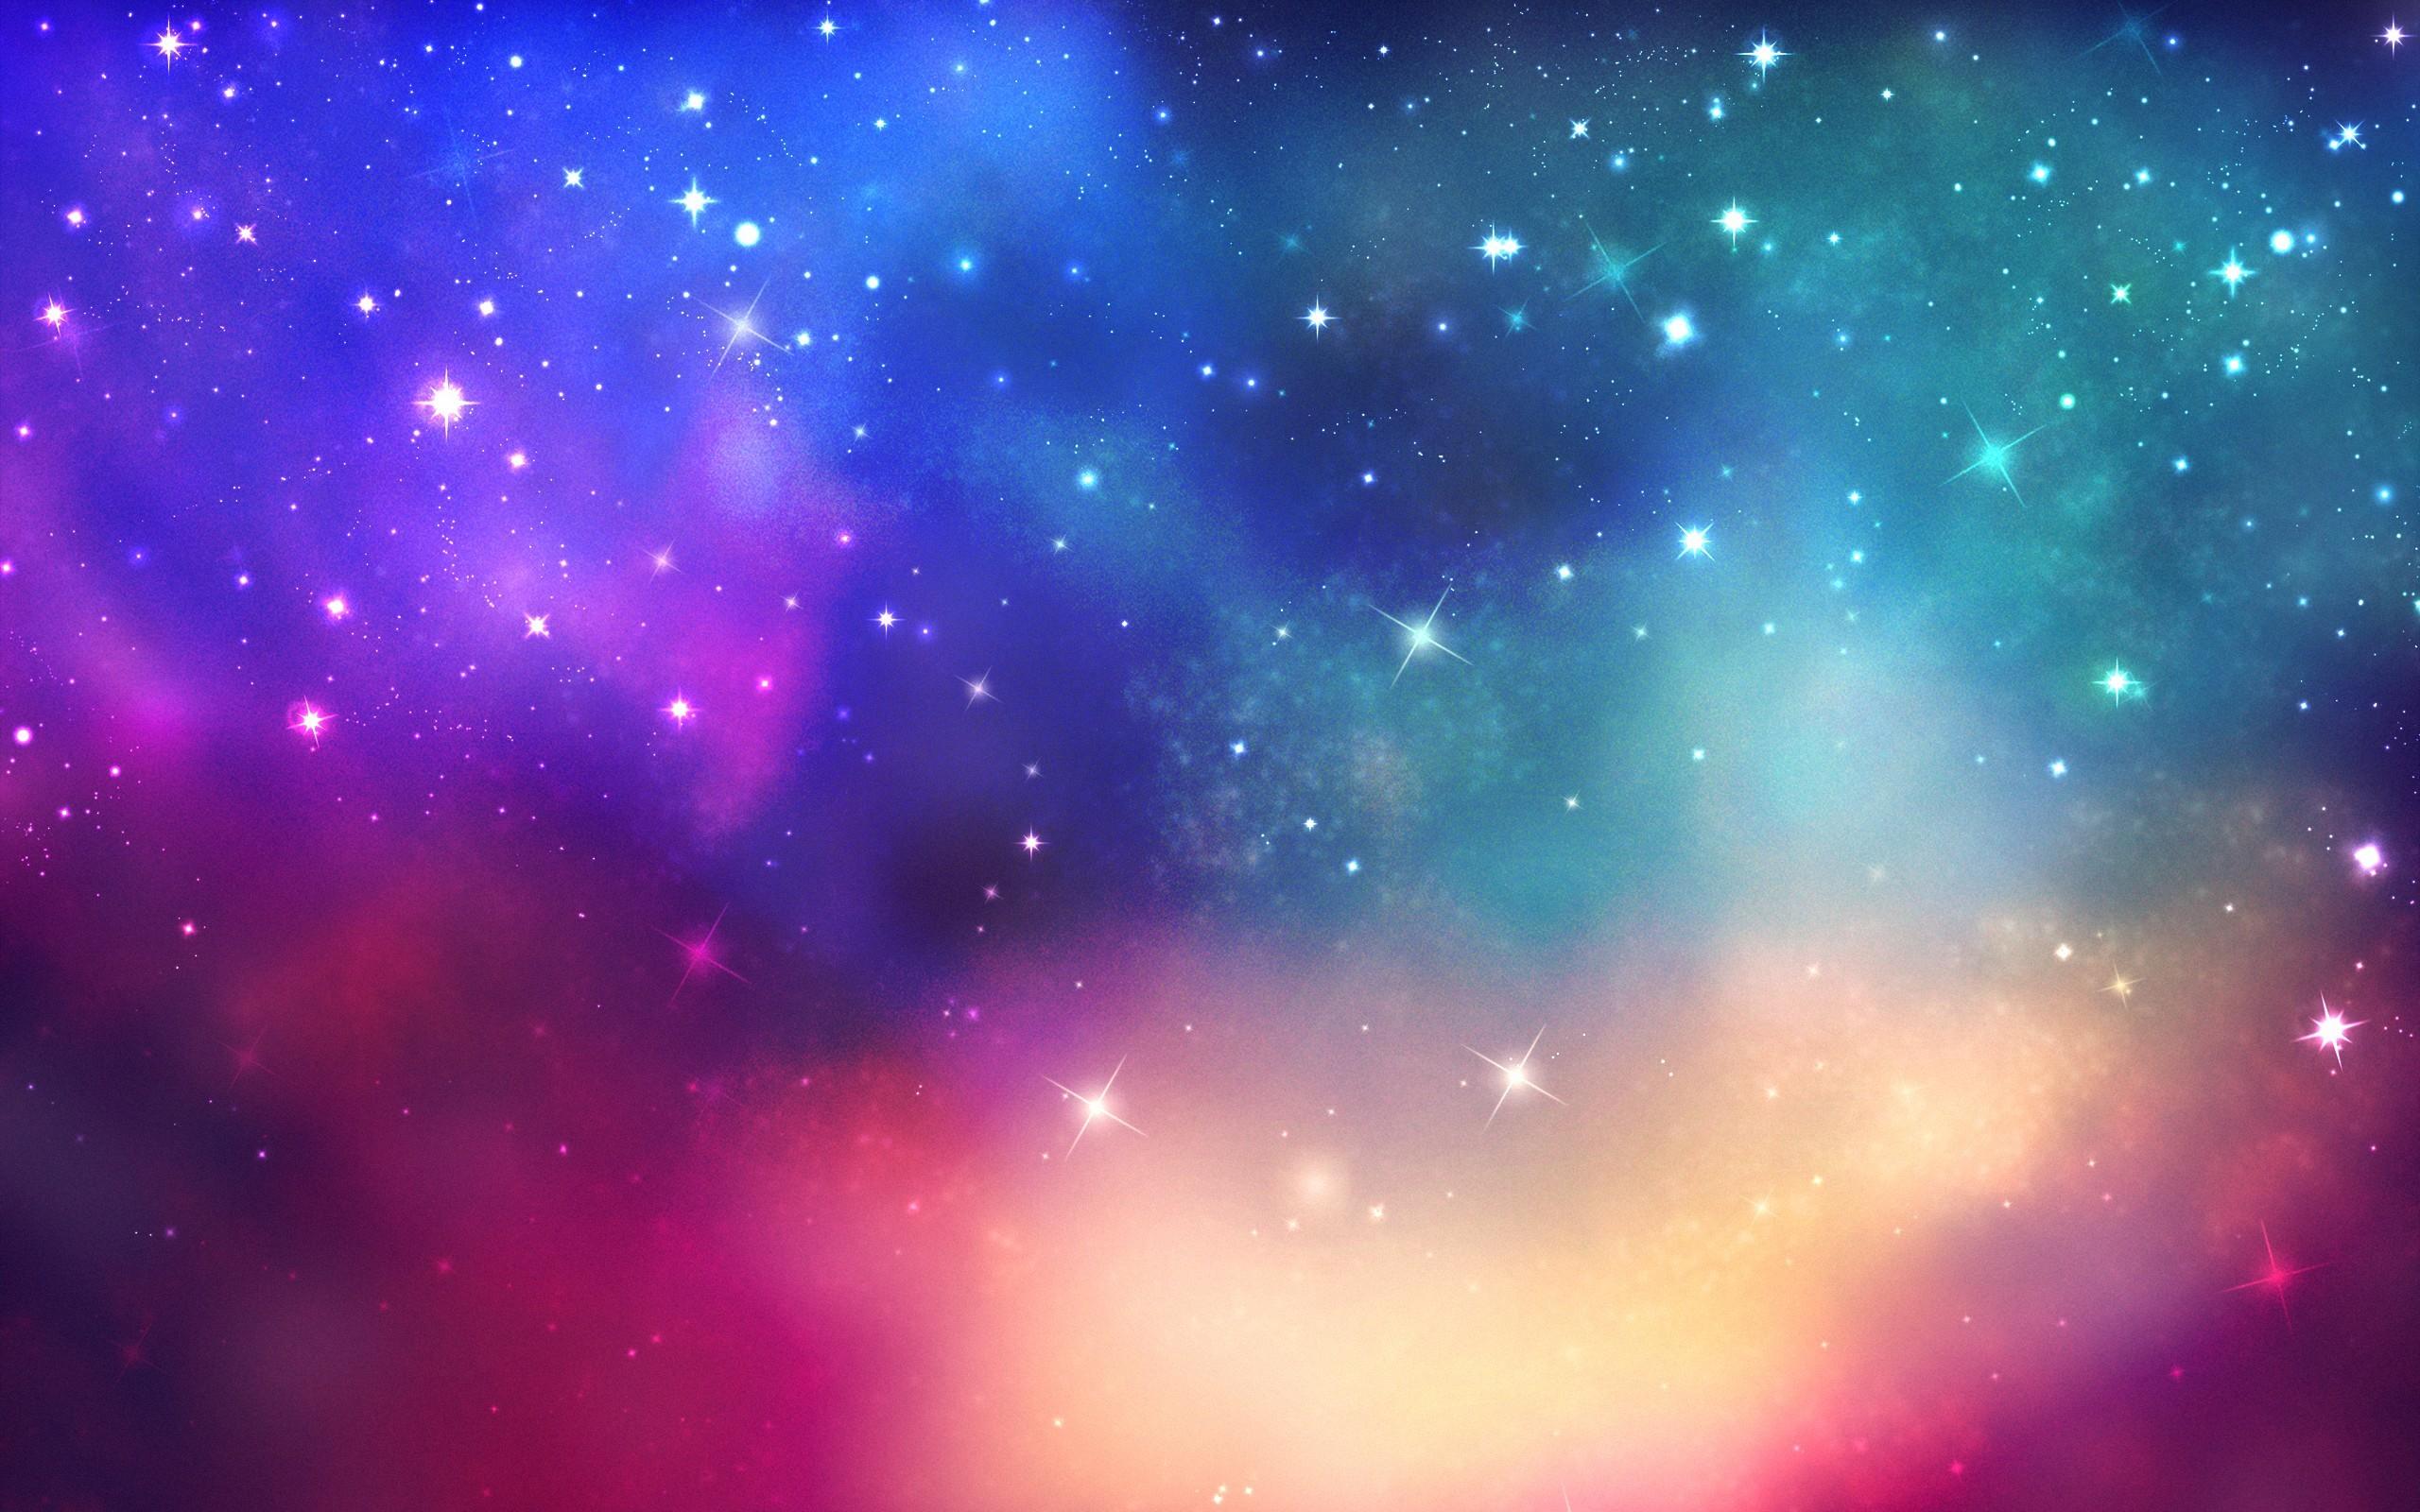 Galaxy Widescreen Wallpaper 67 Images